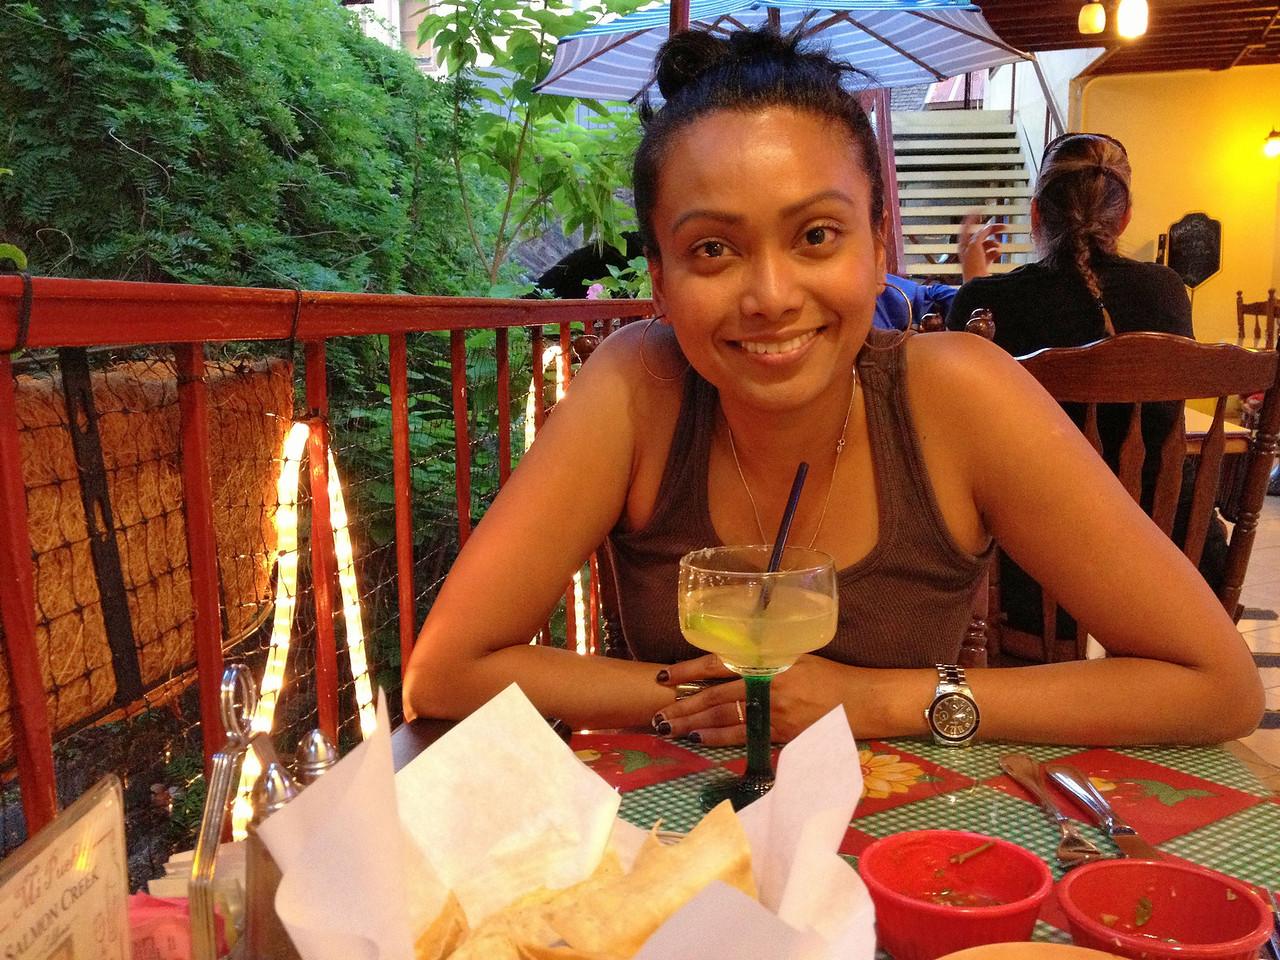 Dinner in Sonora